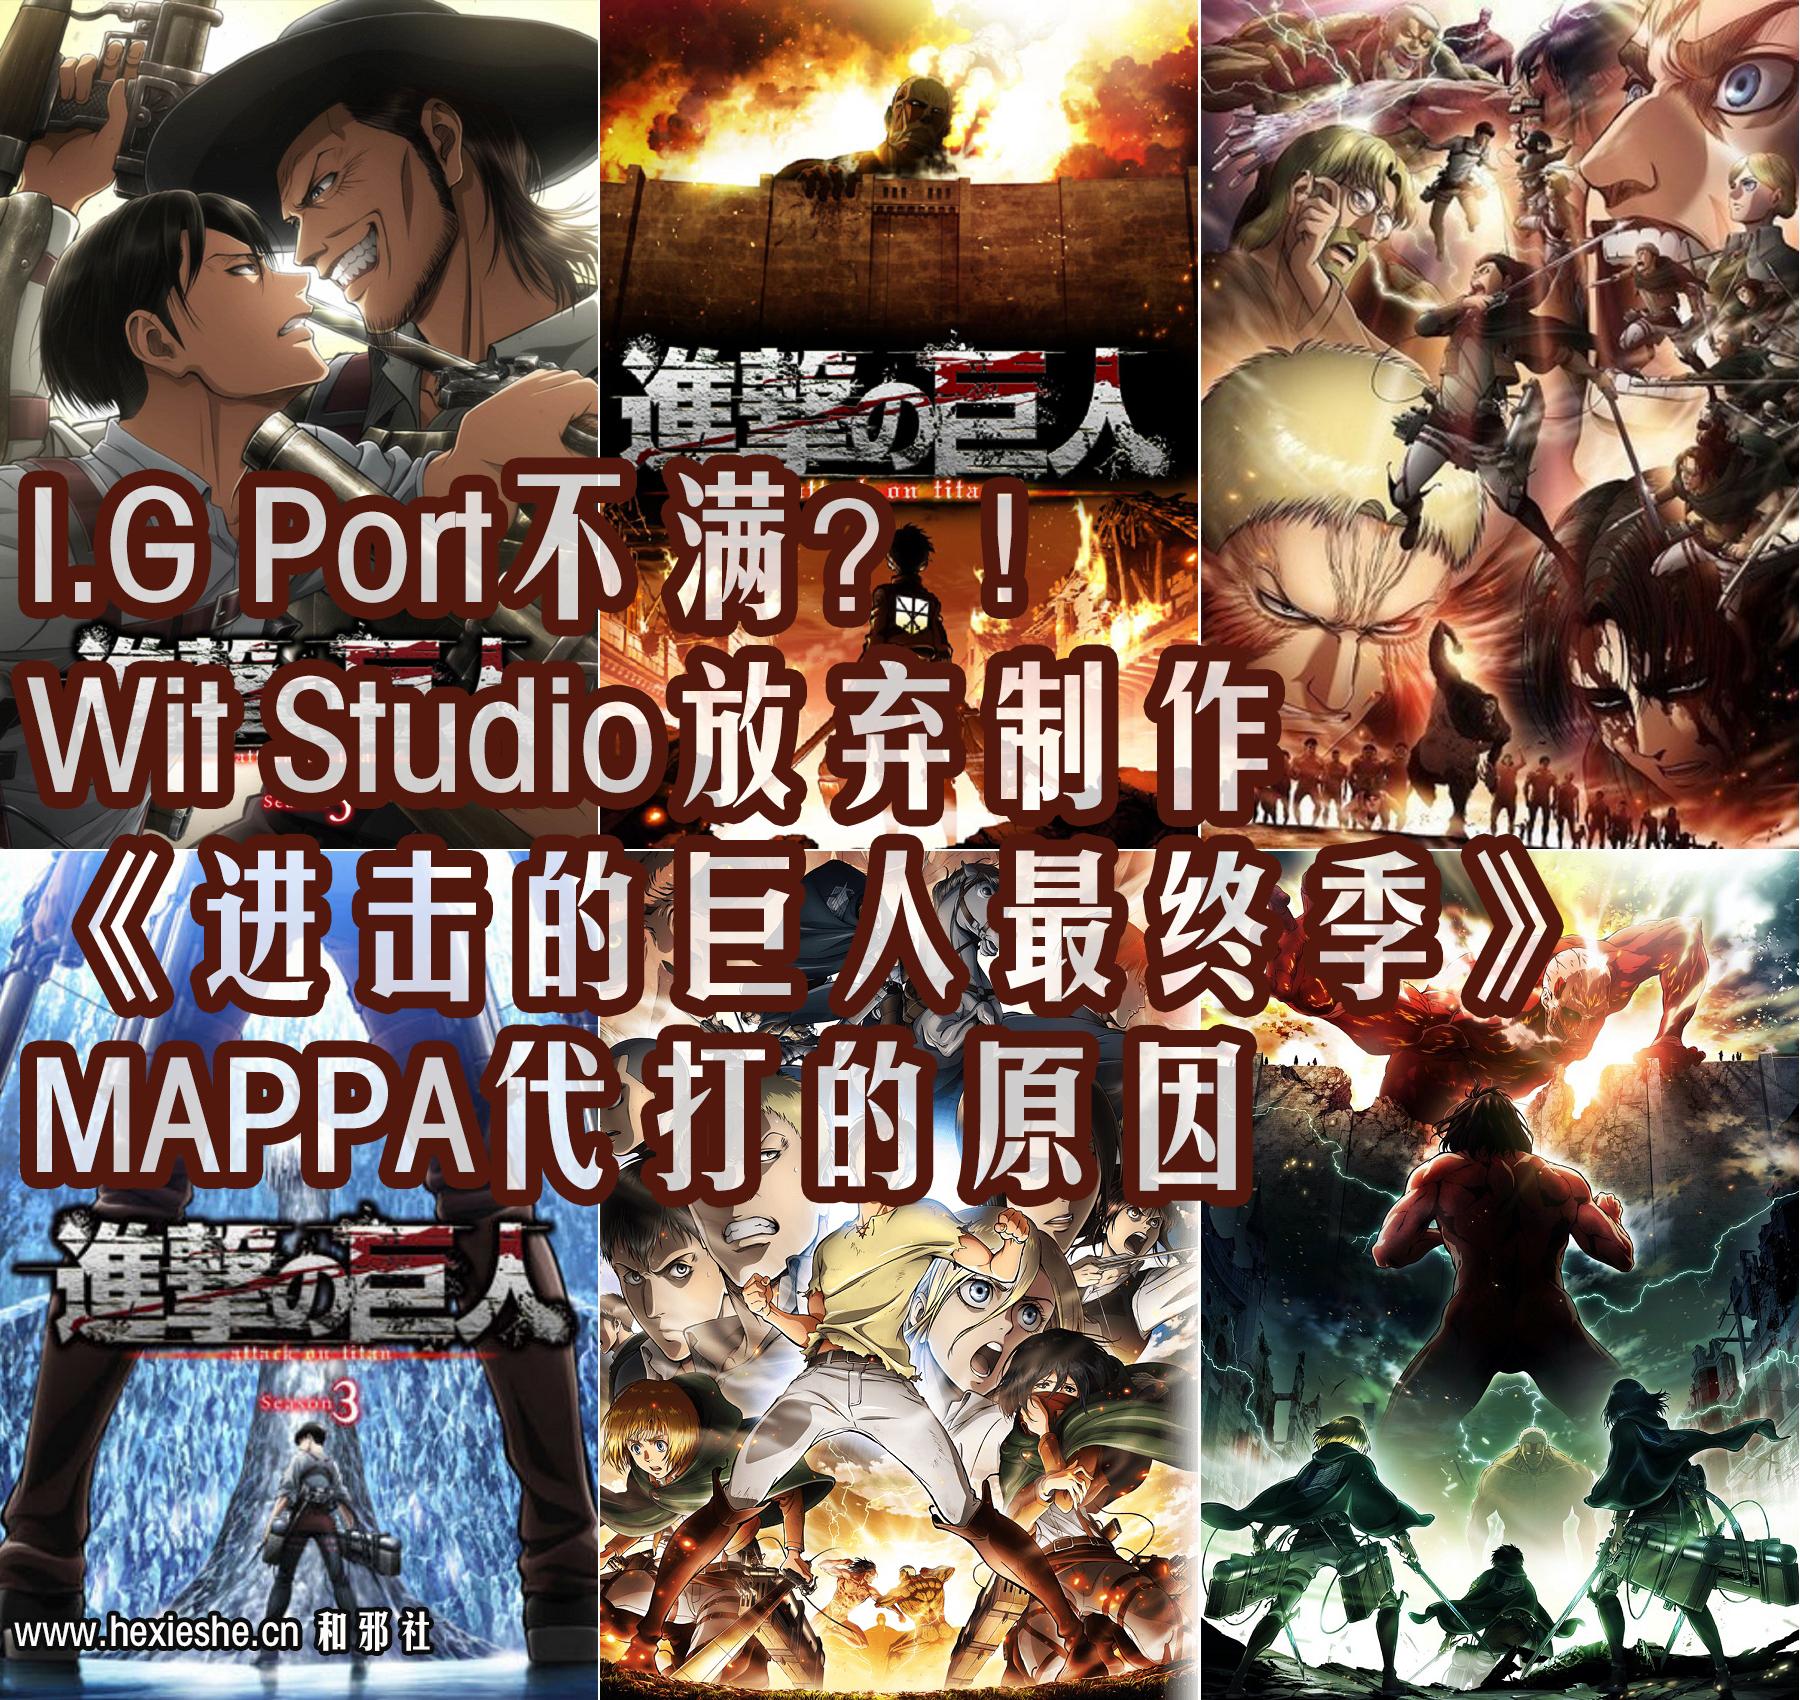 I.G Port Wit Studio 进击的巨人最终季 MAPPA